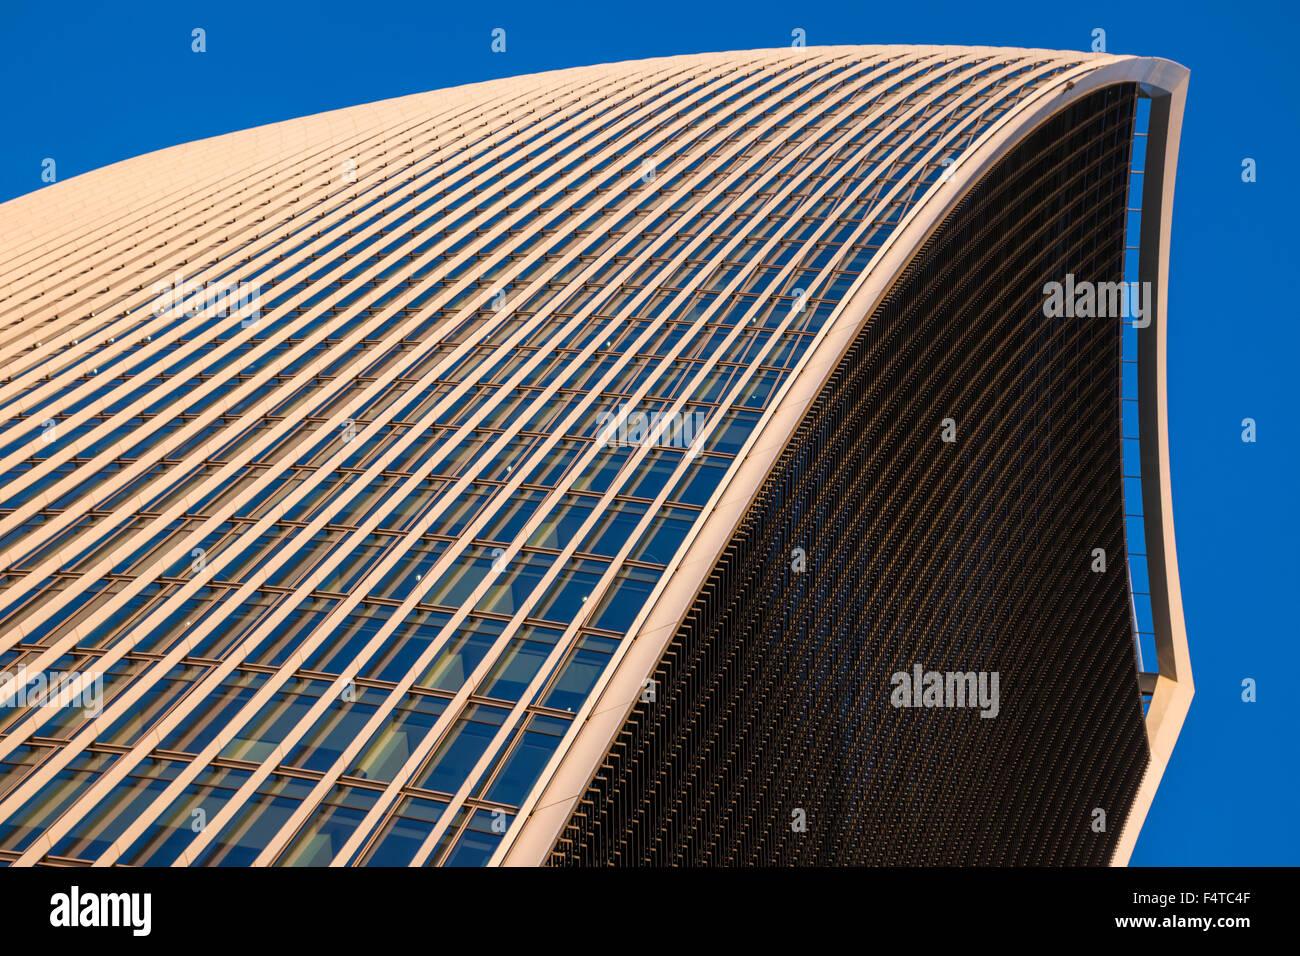 England, London, City, 20 Fenchurch Street aka The Walkie-Talkie Building, Architect Rafael Vinoly Stock Photo